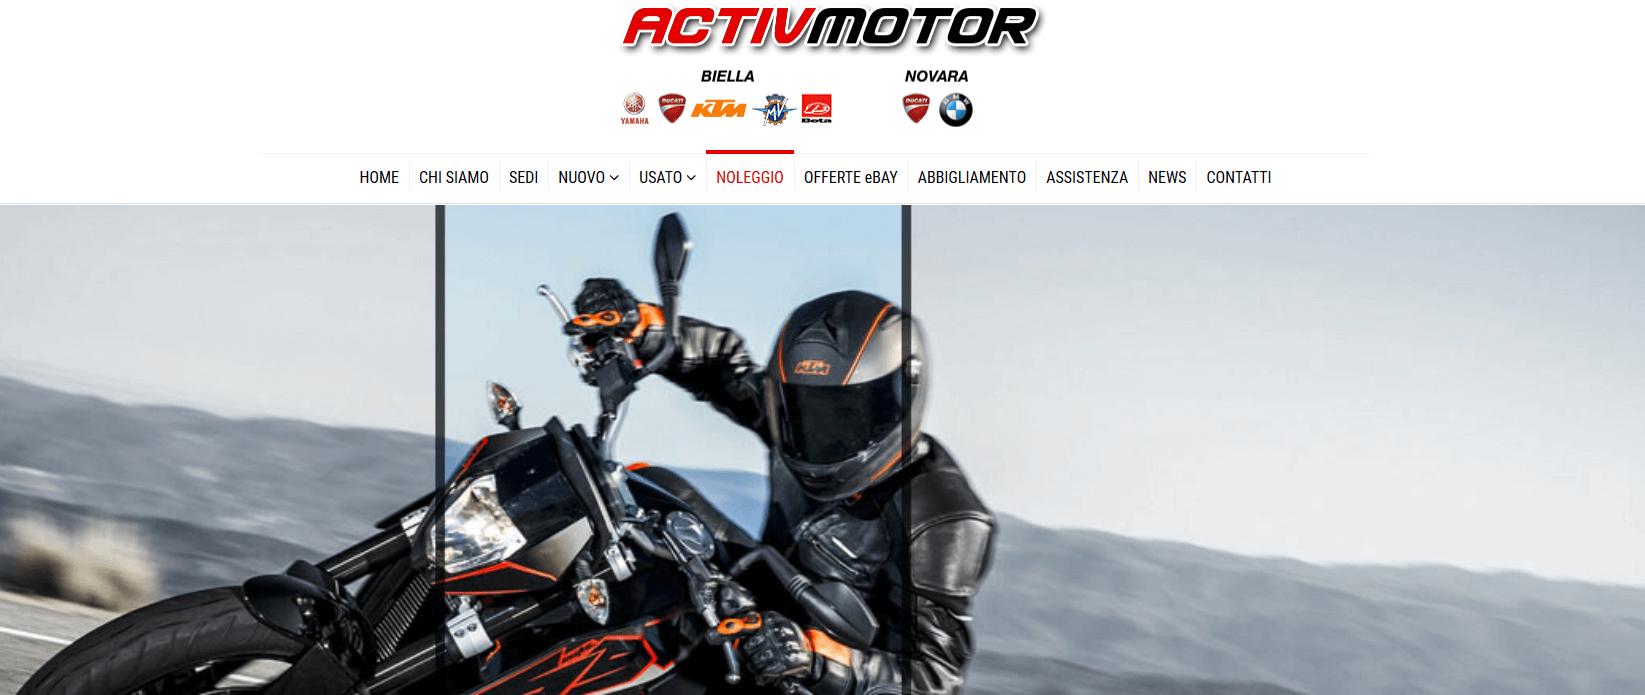 11 migliori siti noleggio moto